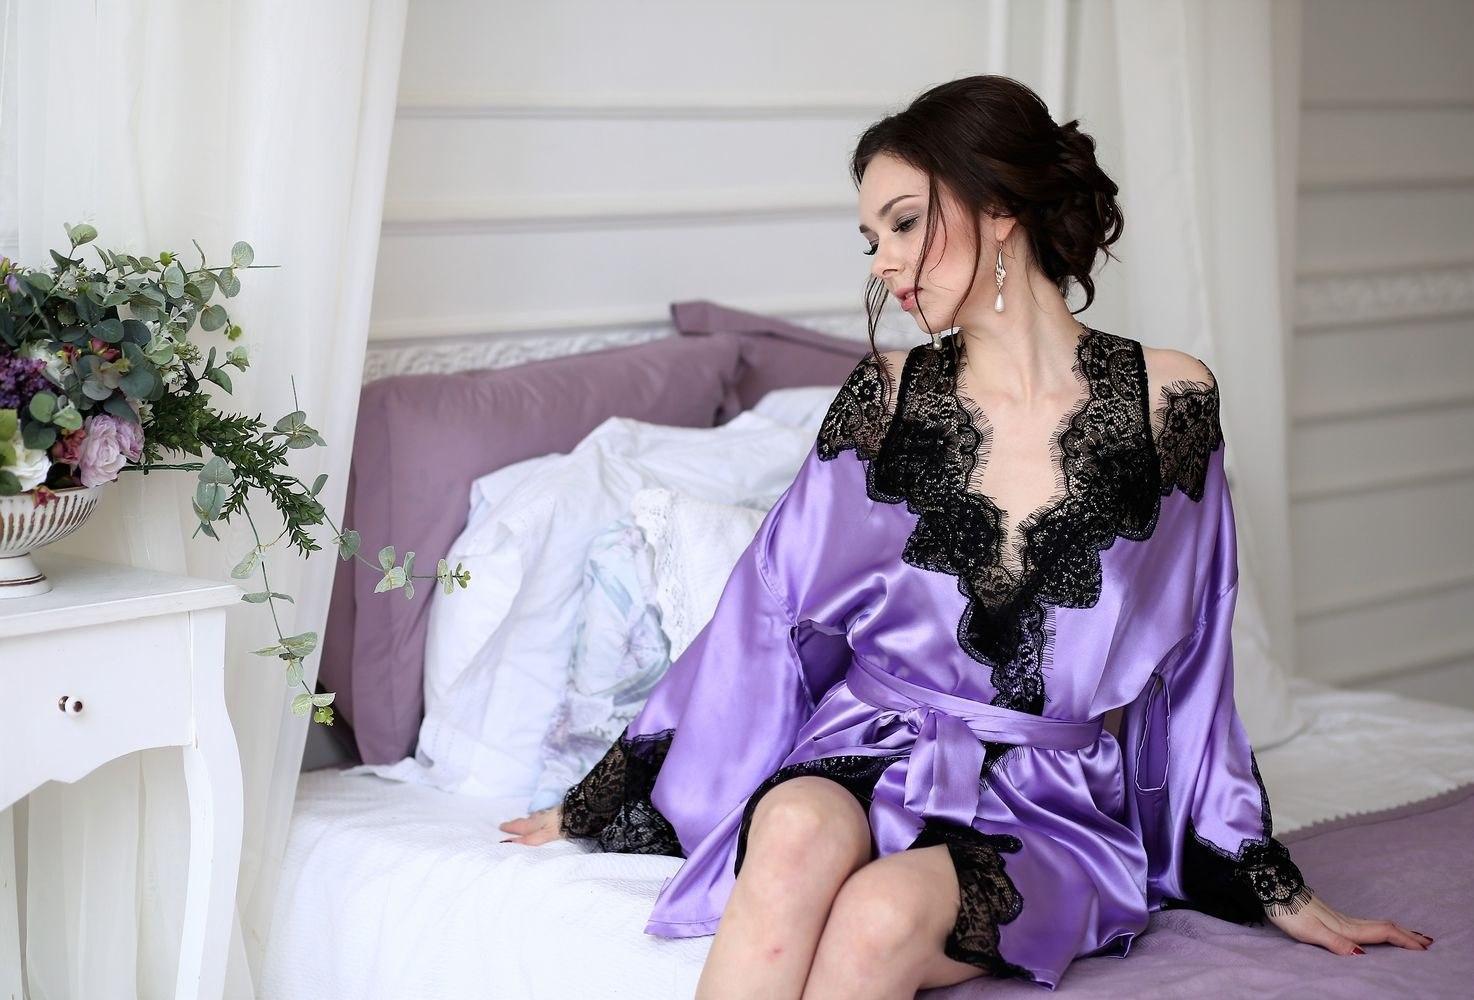 Silk Satin Dress: Silk Satin Clothes Dress Lingerie Nightwear